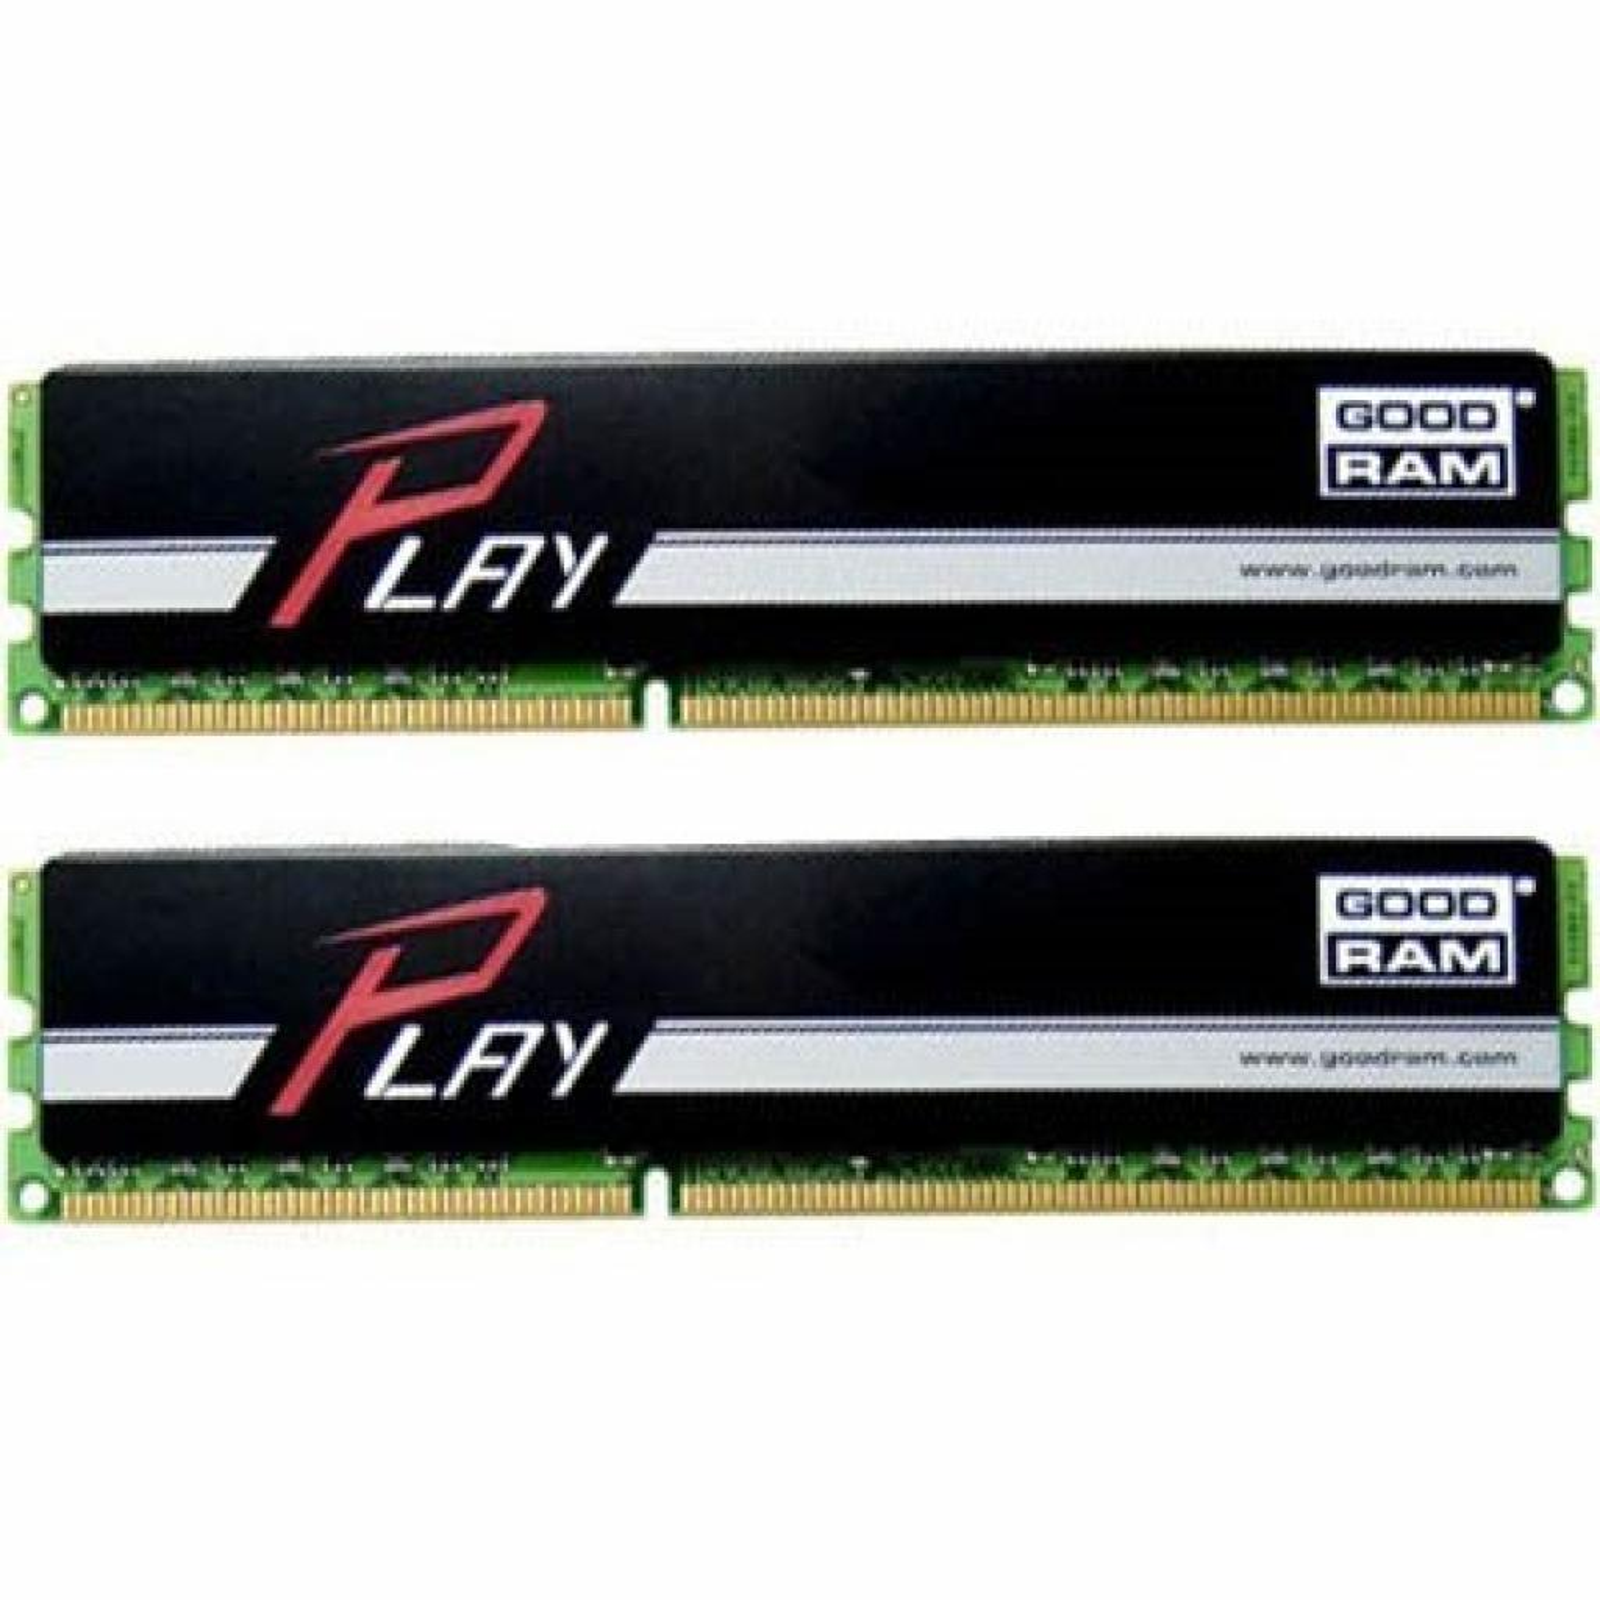 Модуль памяти для компьютера DDR3 8GB (2x4GB) 1600 MHz GOODRAM (GR1600D364L9/8GDC)